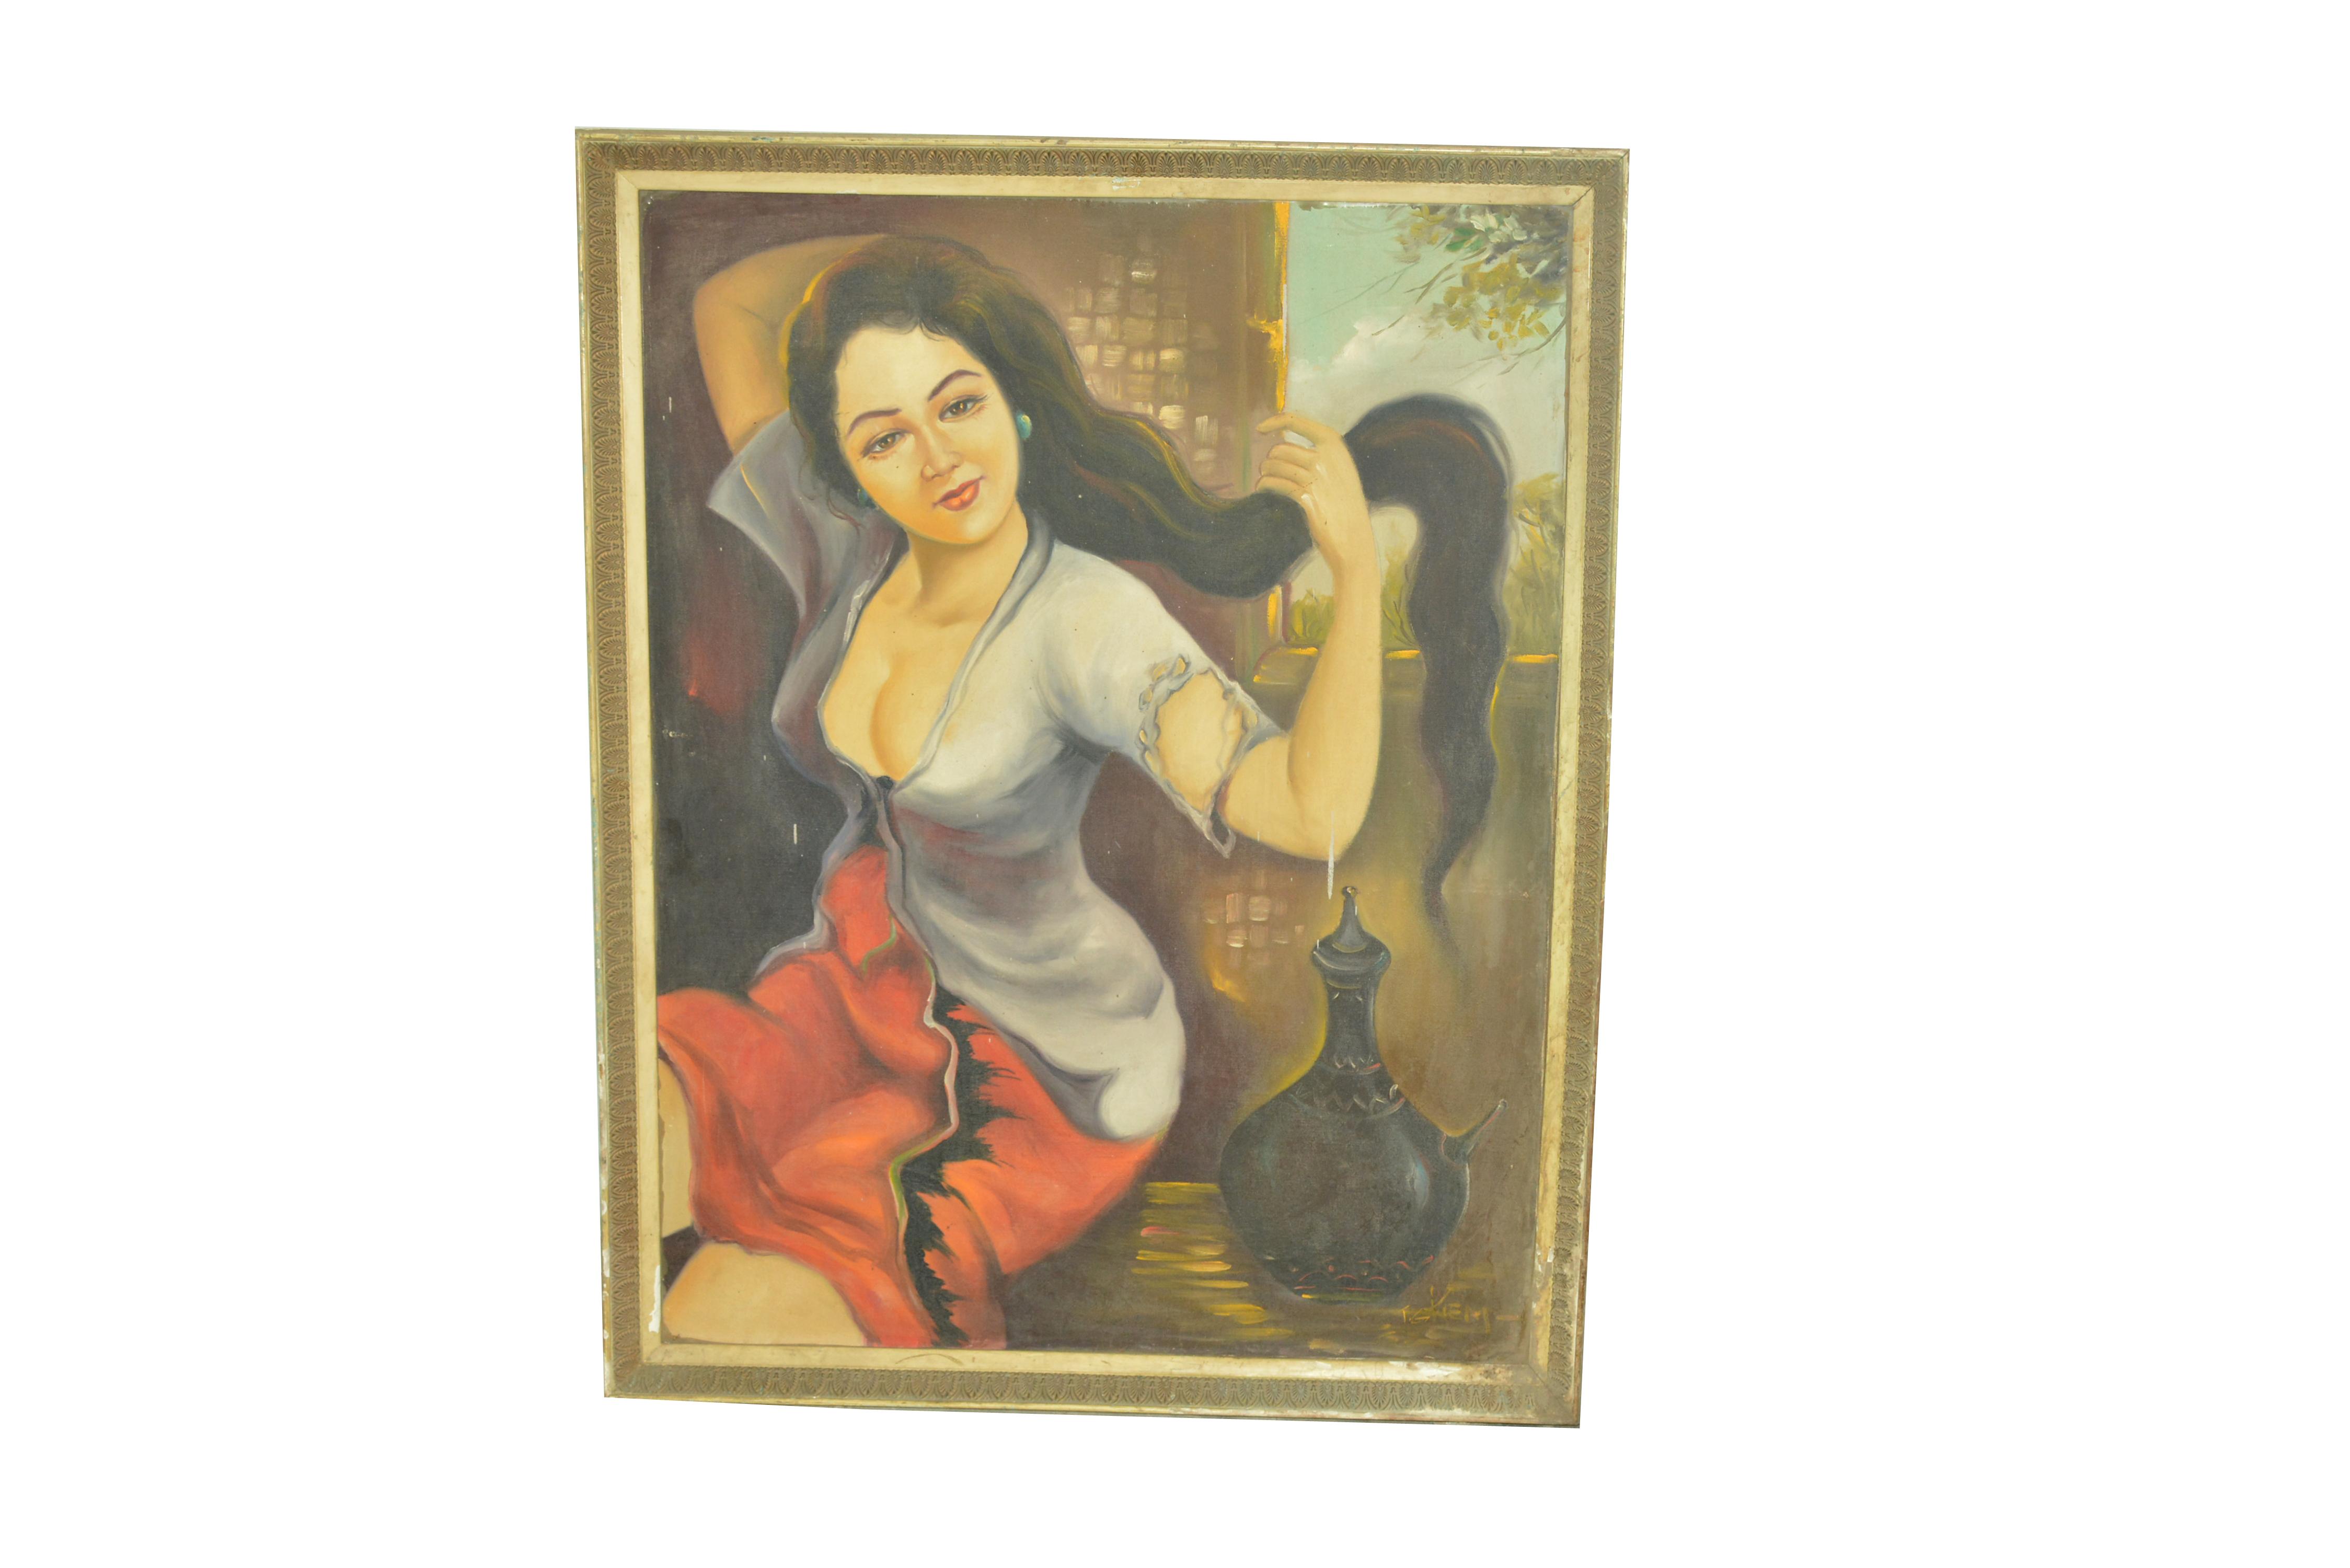 ANRA1323 - 76 x 2 x 96 cm